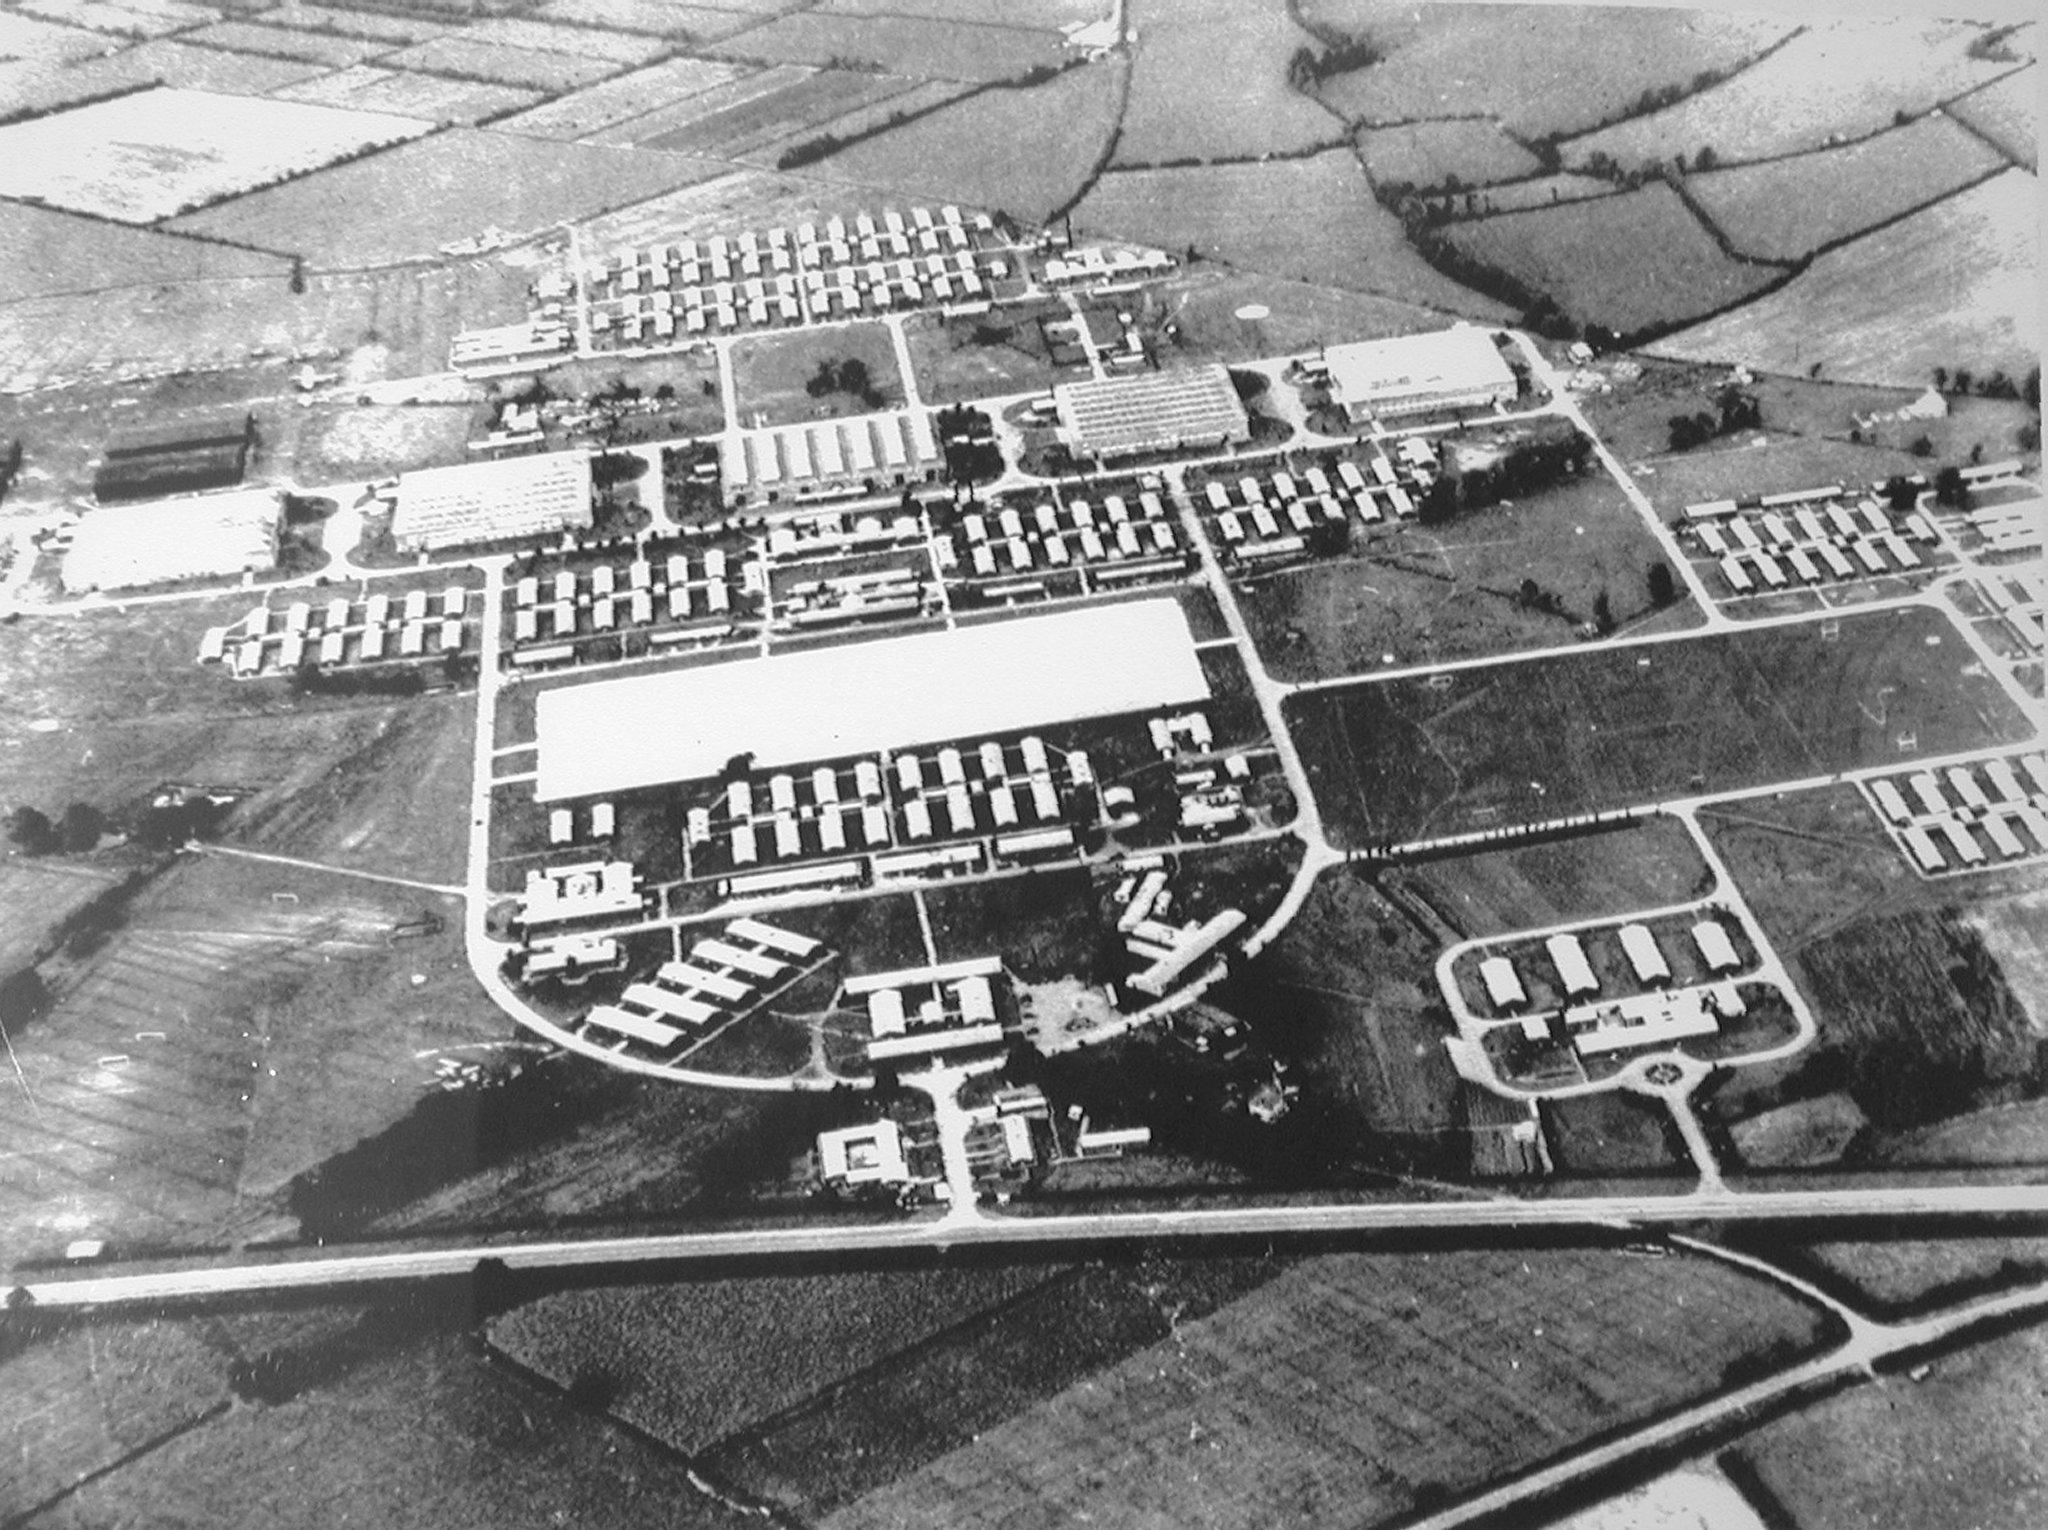 Royal Air Force Locking Apprentices Association